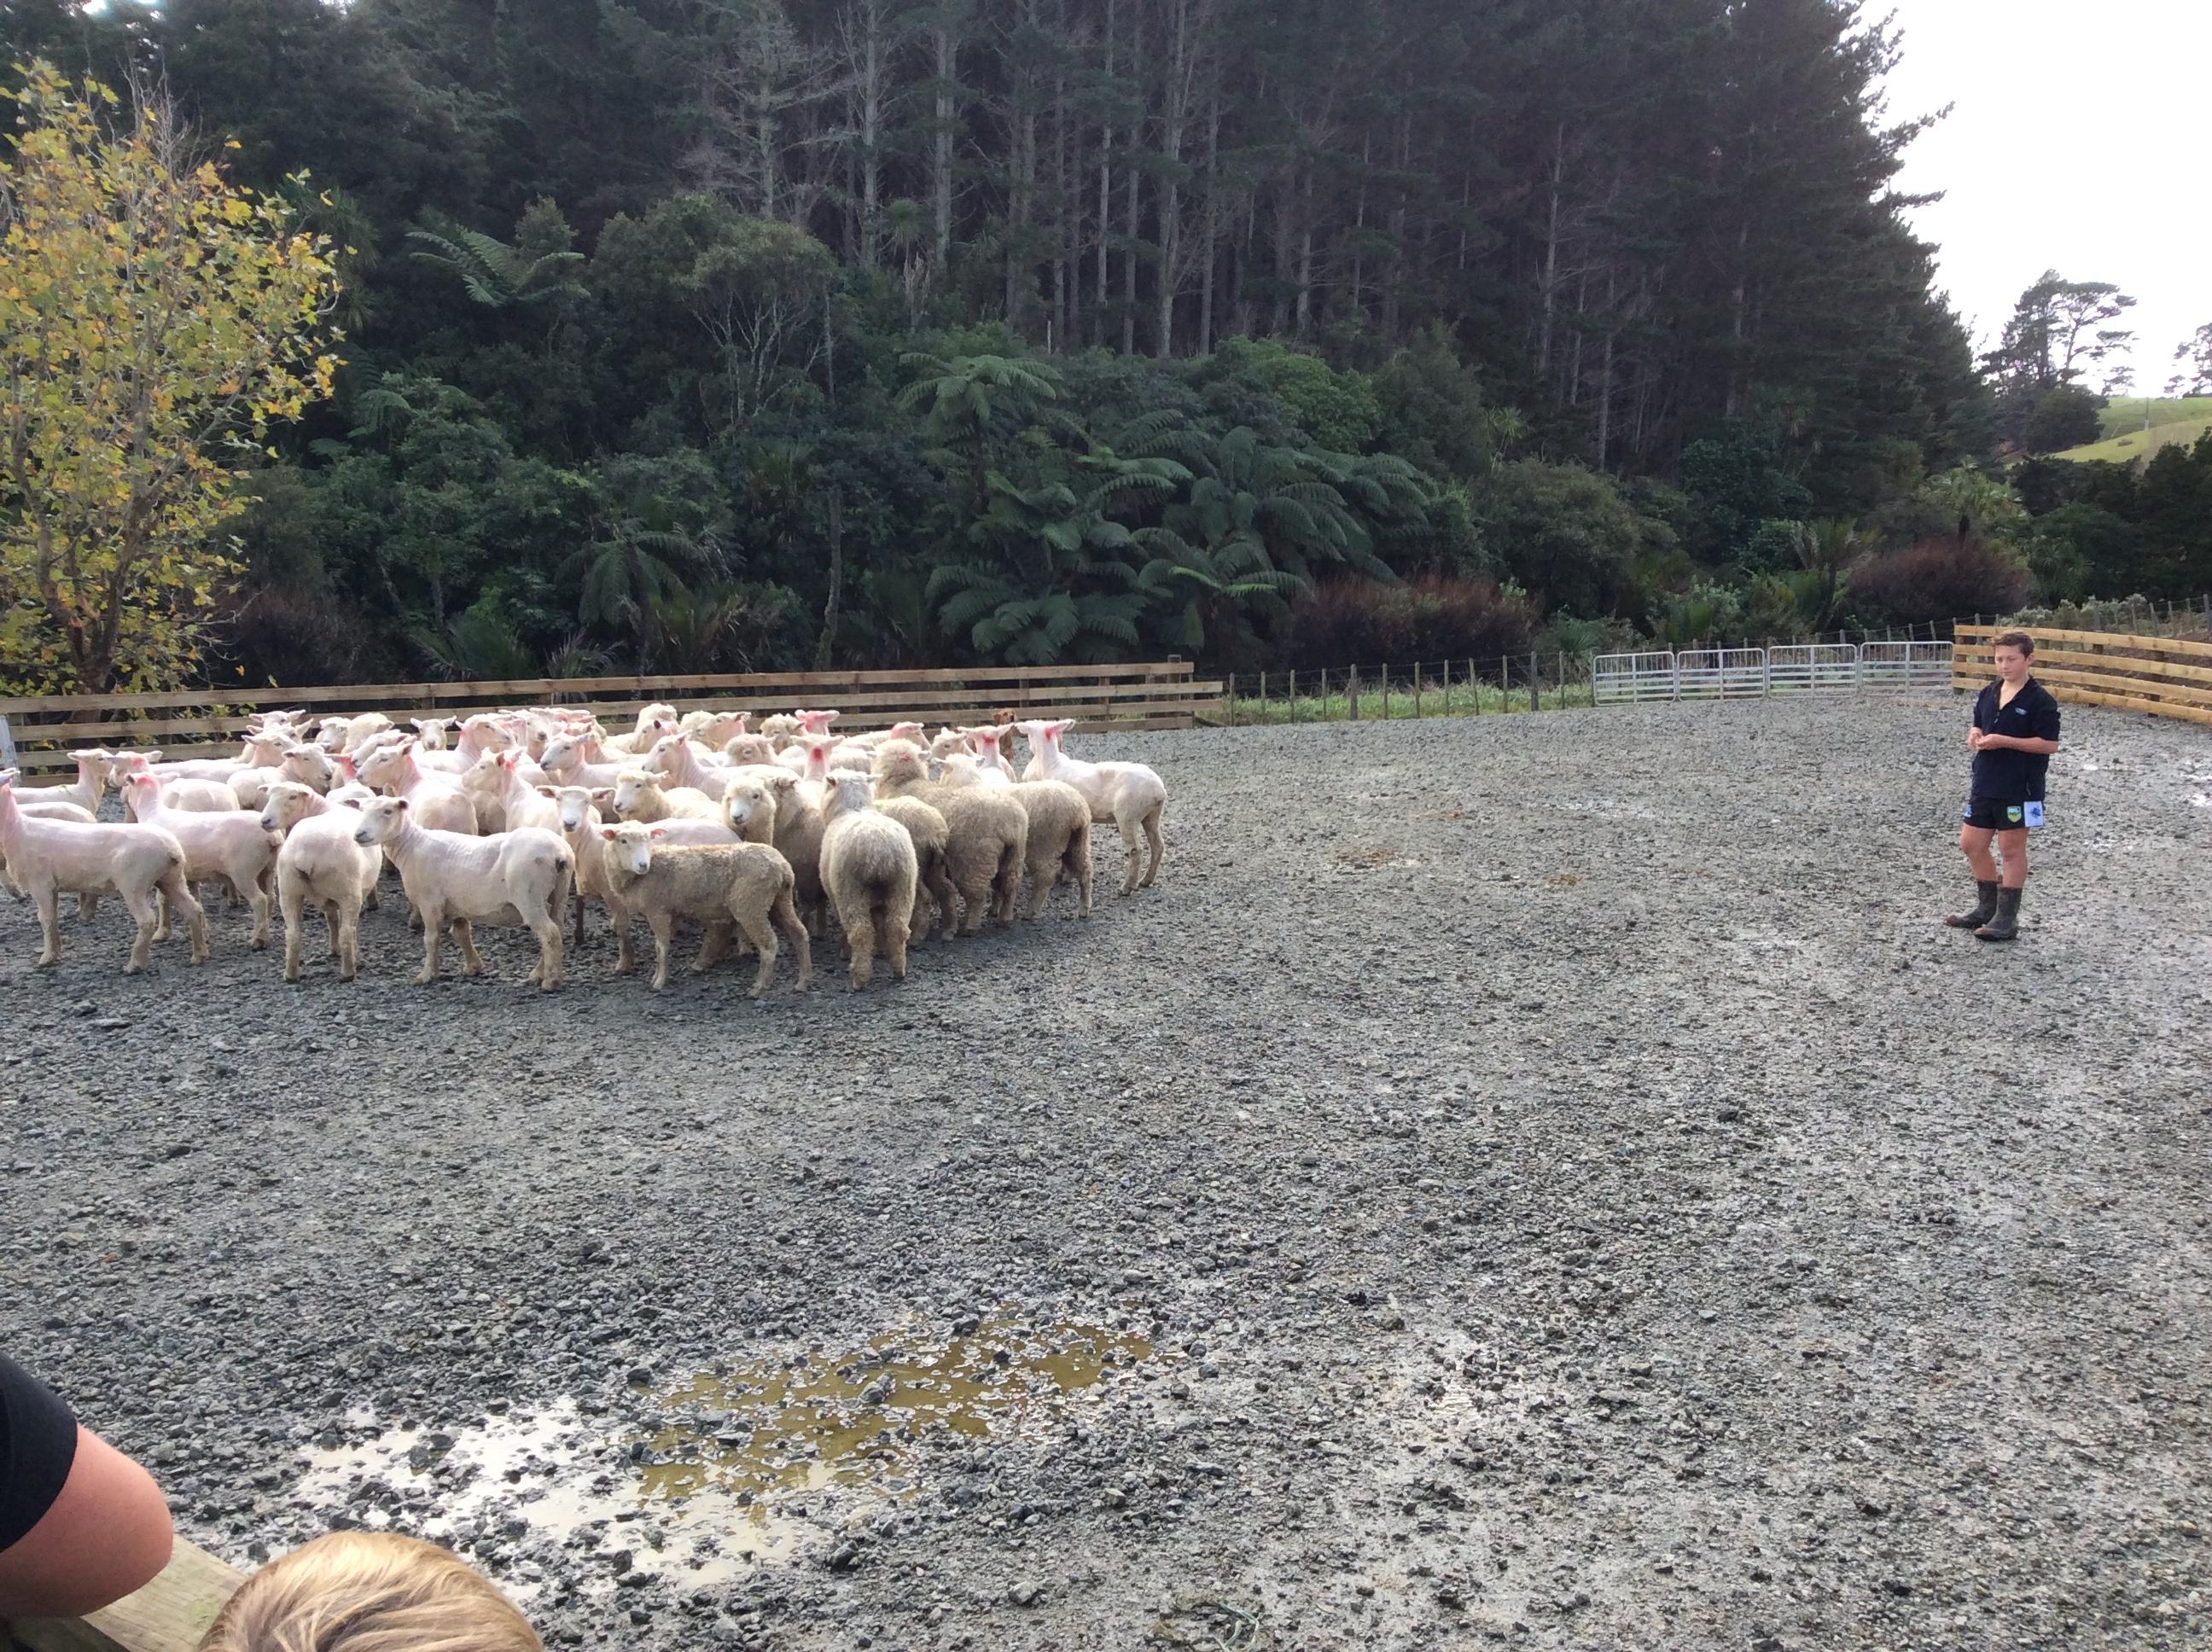 Berger Farm